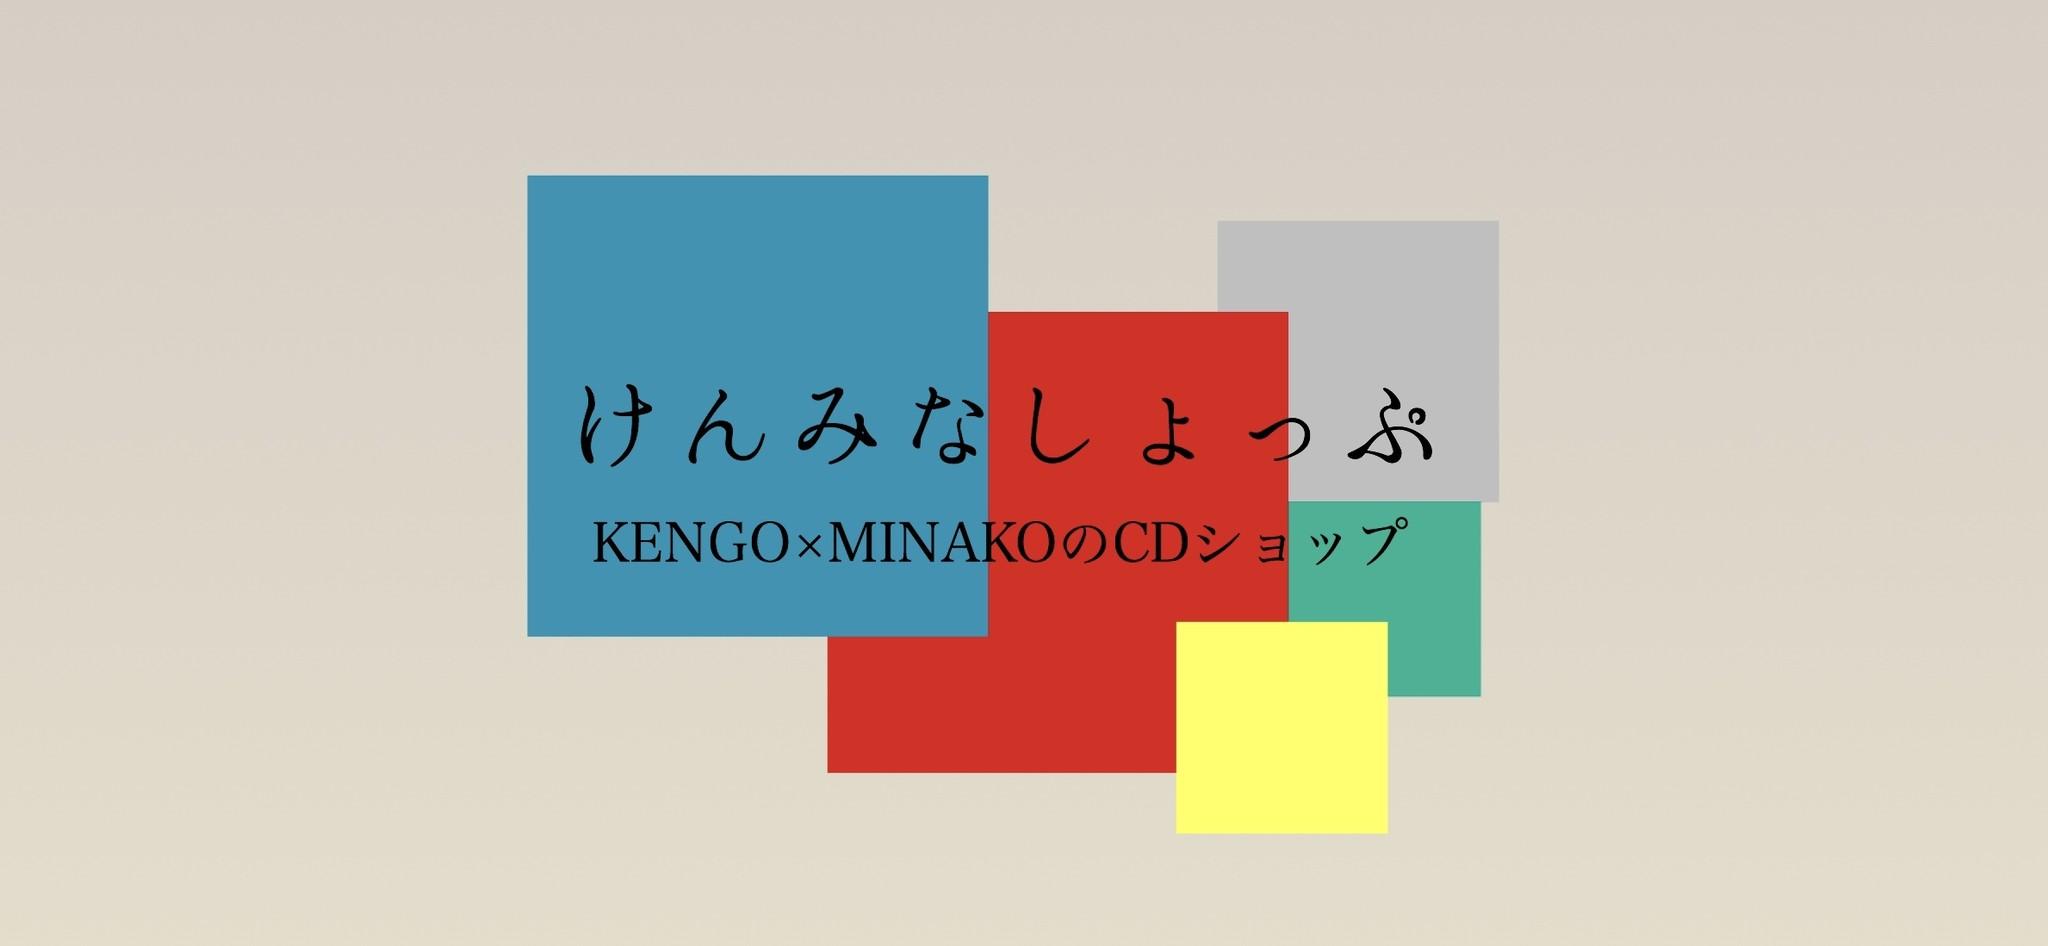 KENGO×MINAKO 公式ホームページ